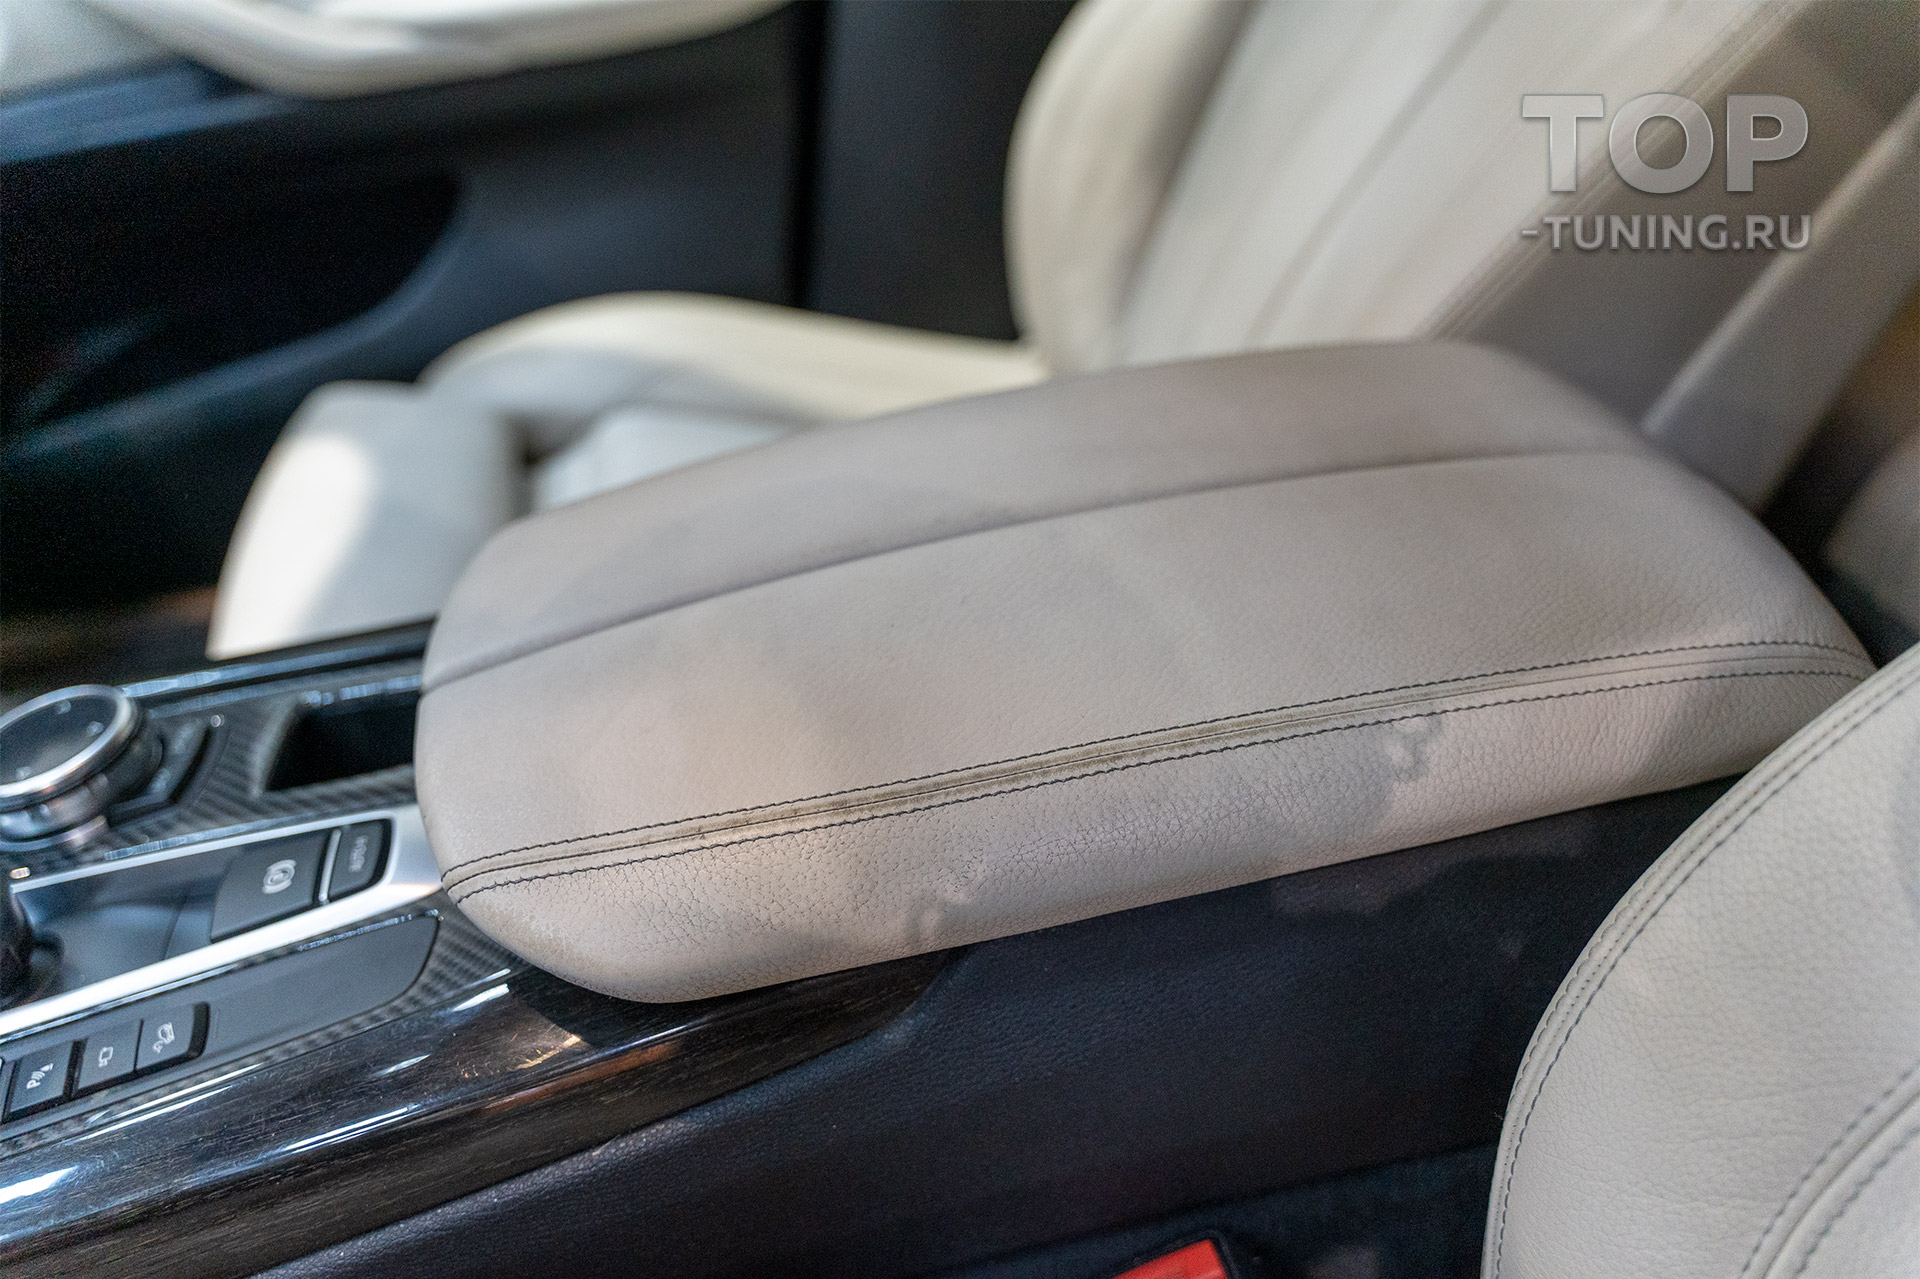 Износ кожи на подлокотнике BMW X5 f15 - белая кожа